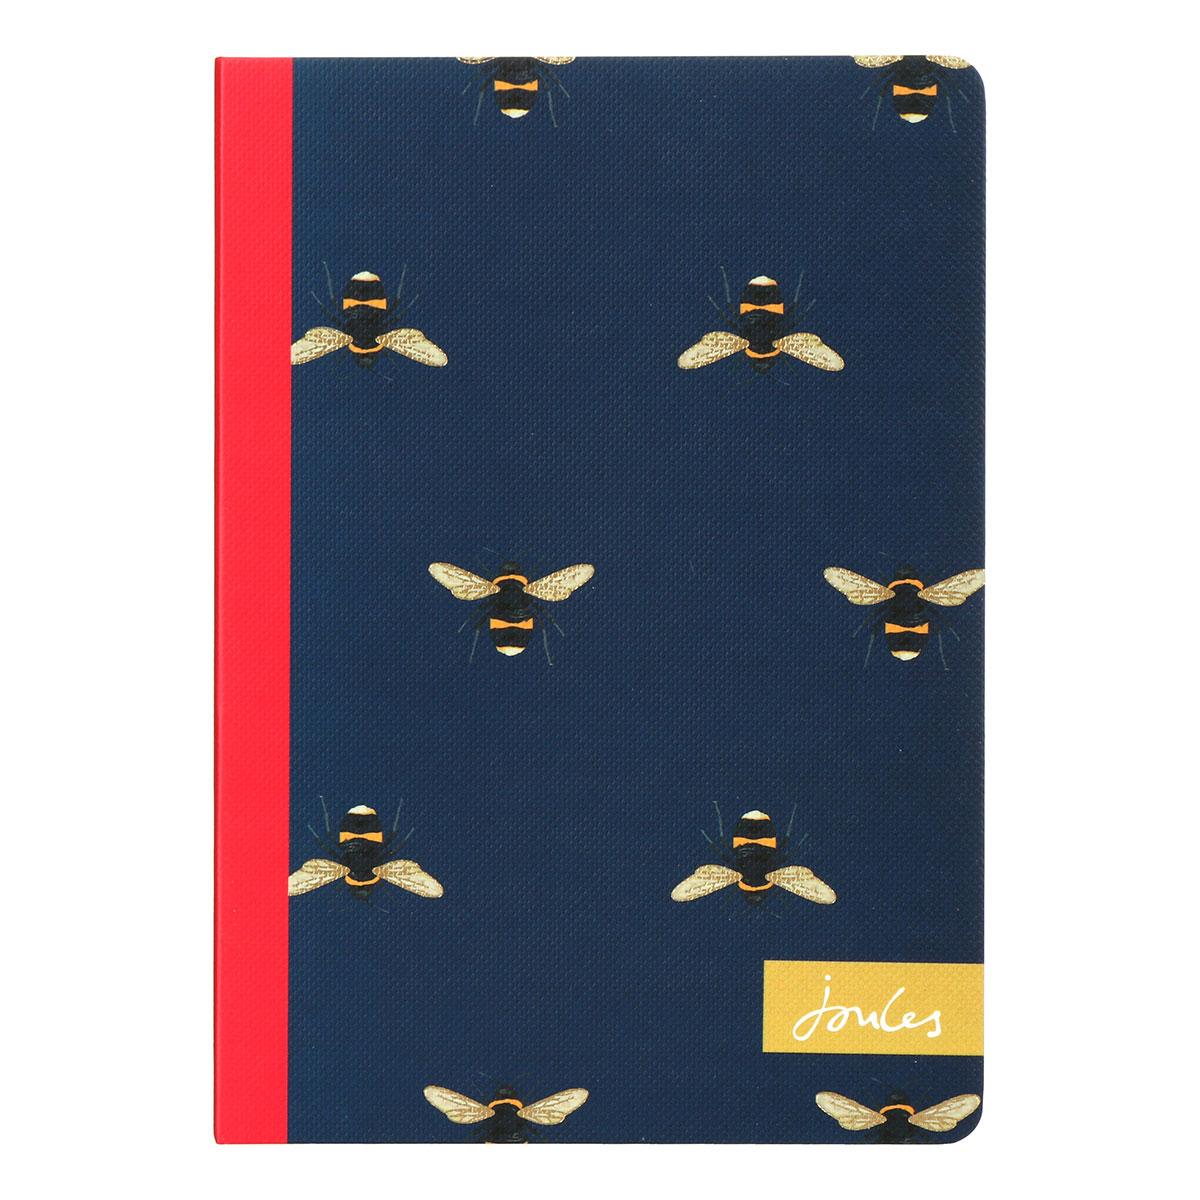 Joules Bircham & Bloom Bees Pocket Notebook